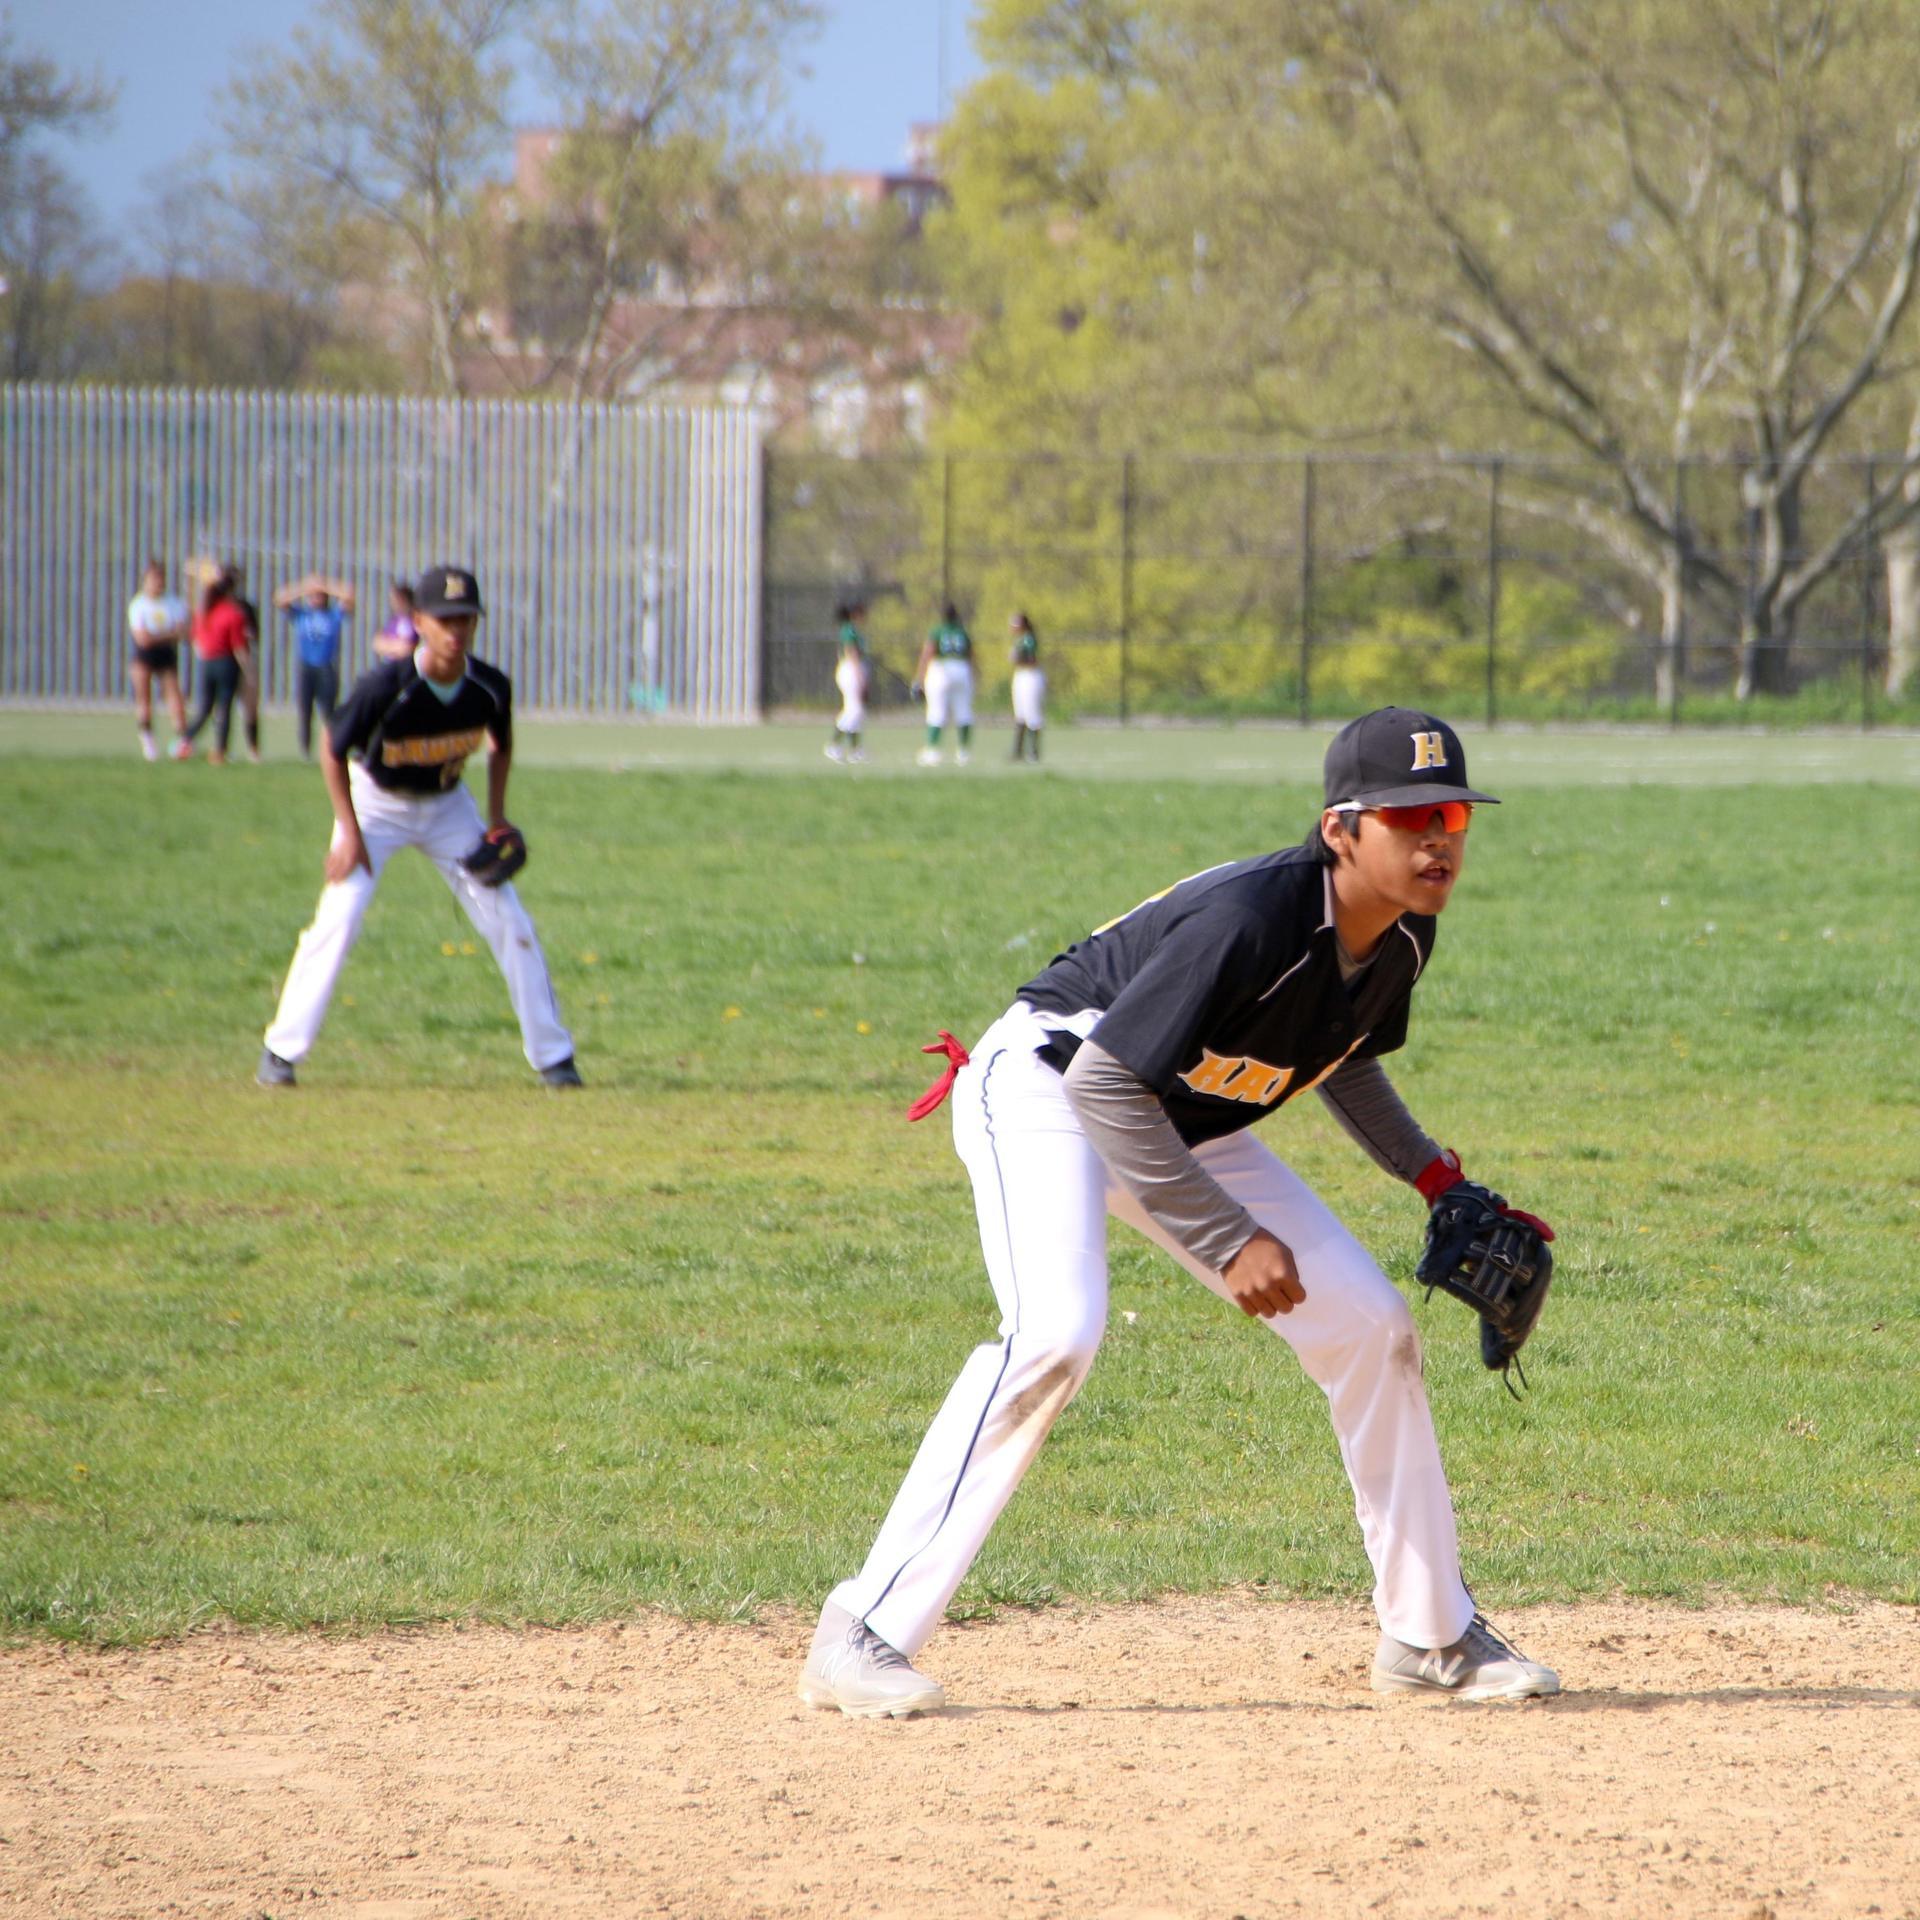 Shortstop fielding the ball.